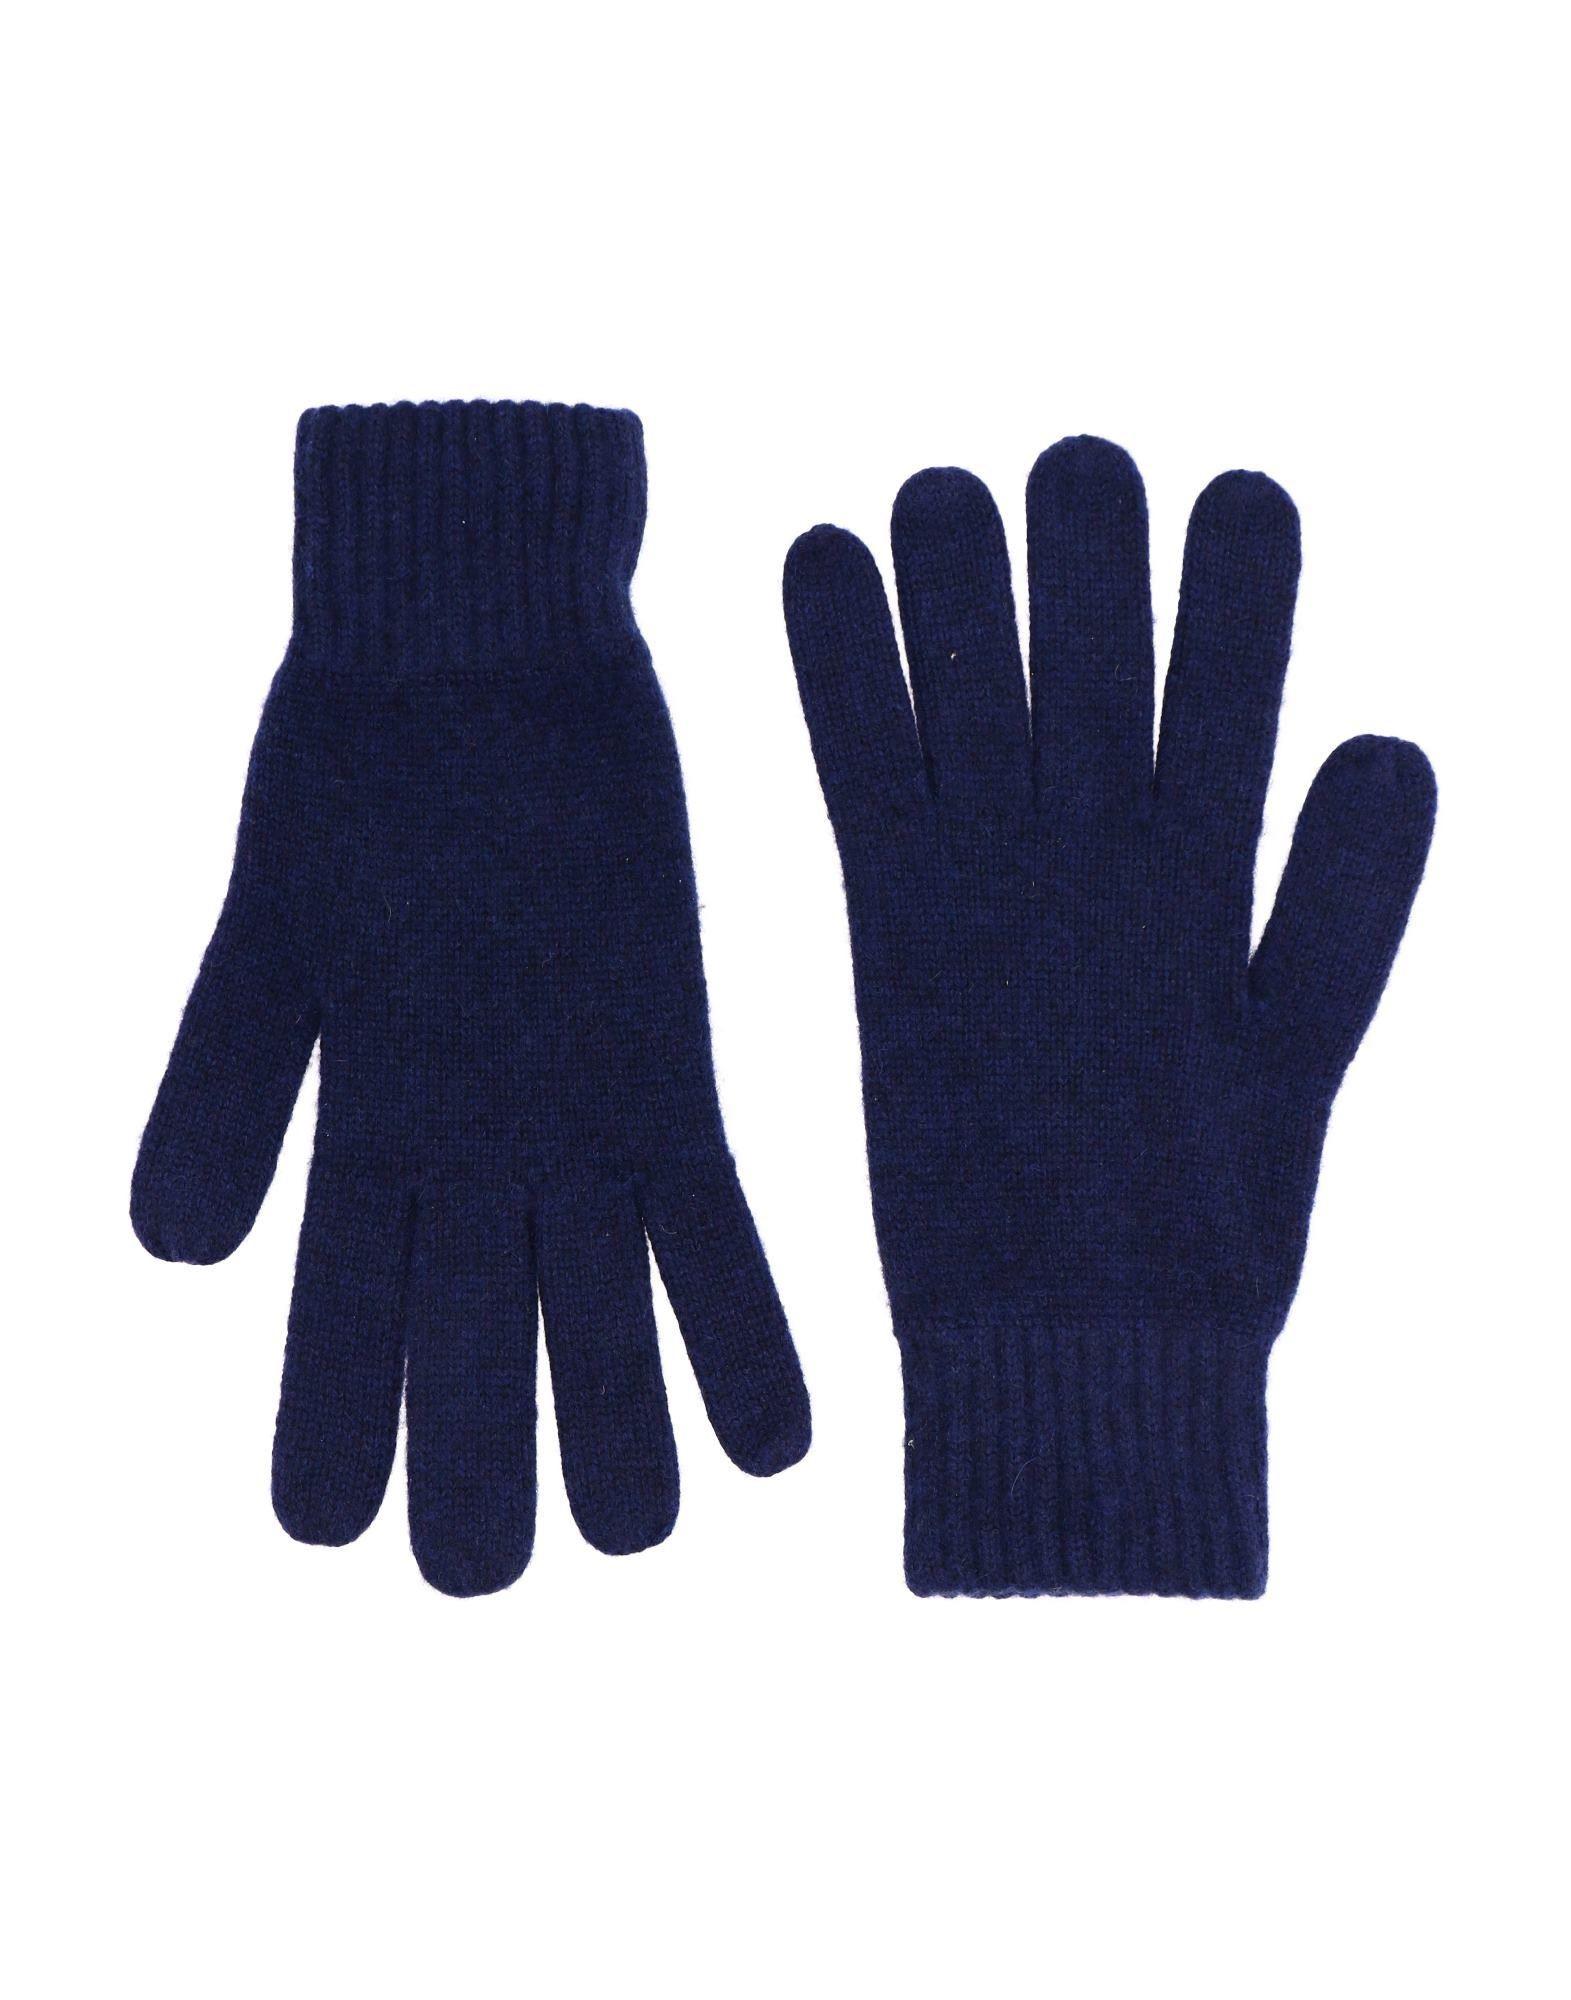 Simon Gray. Gloves In Dark Blue